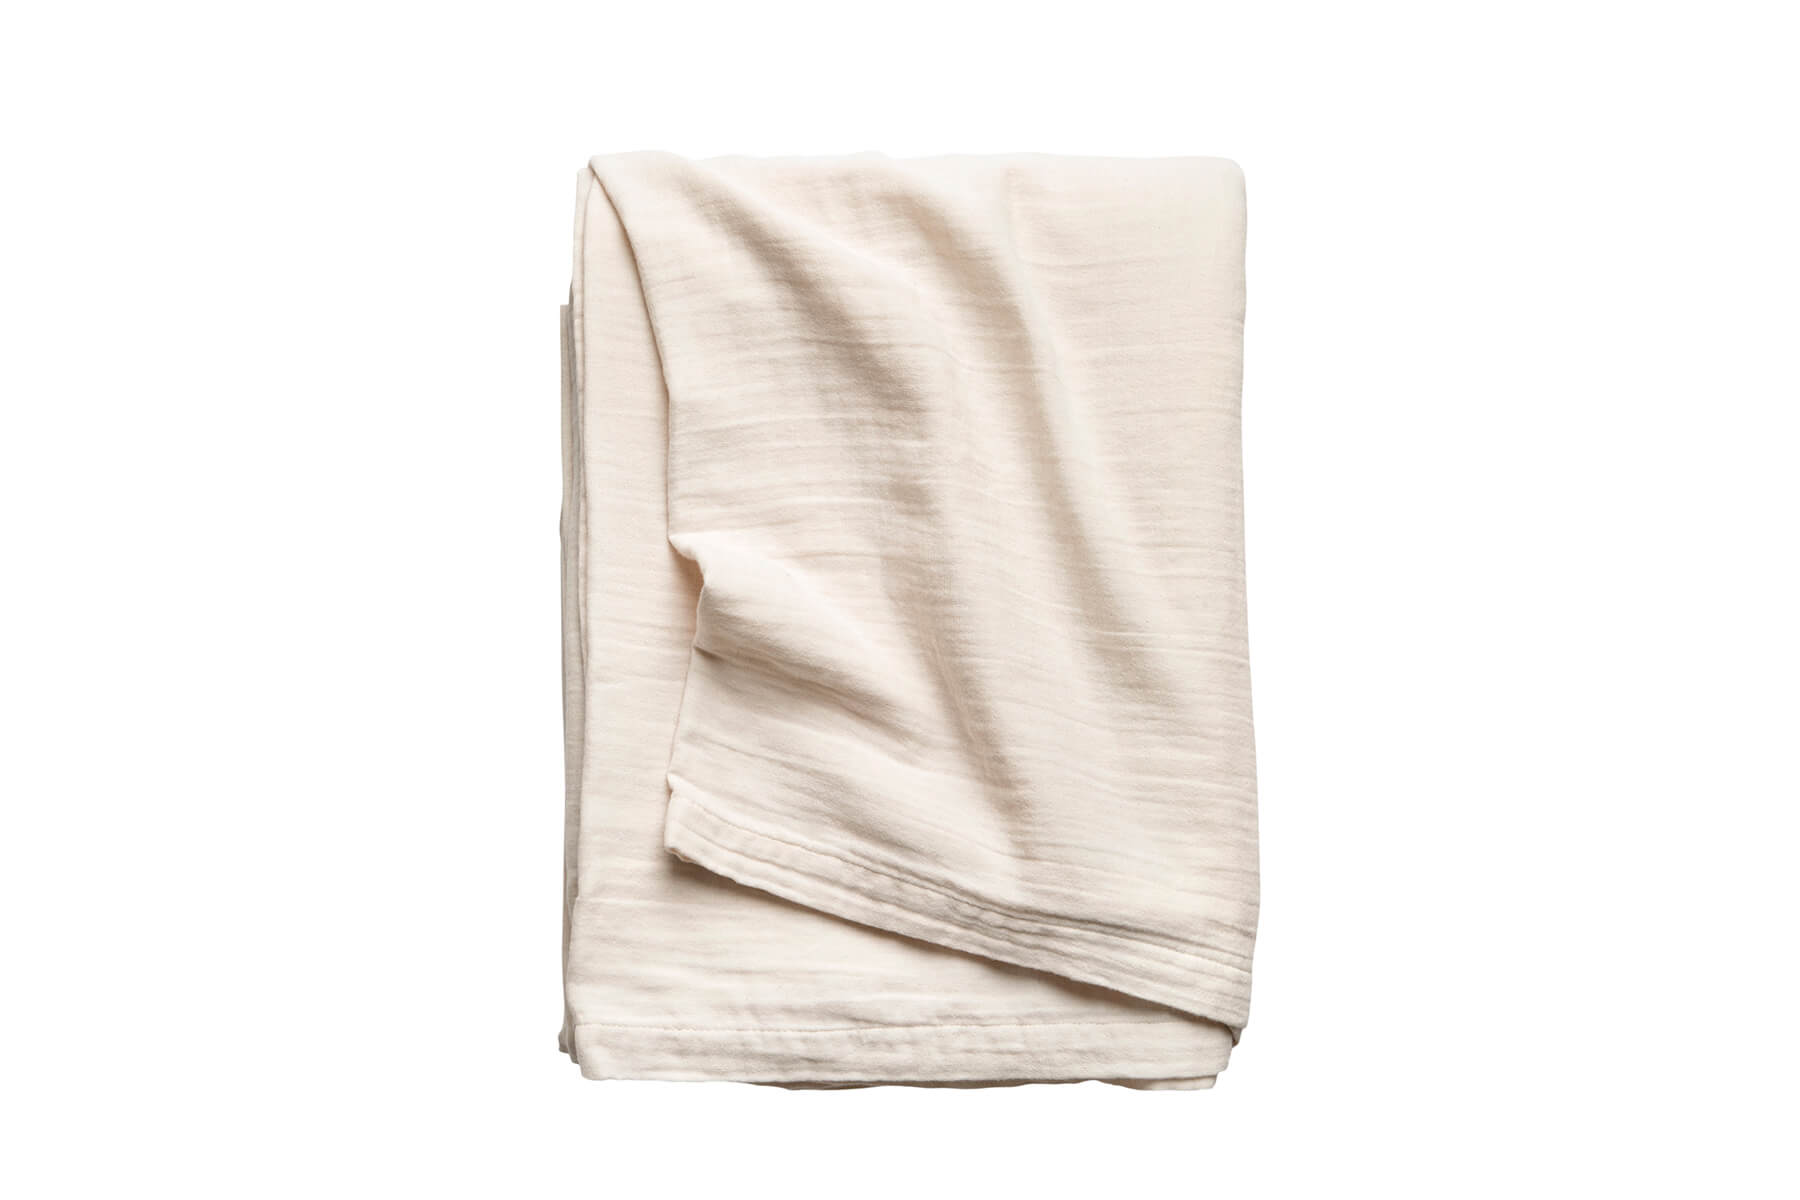 Køb Norhland sengetæppe Lys grå ( White Sand ) 240 x 260 cm